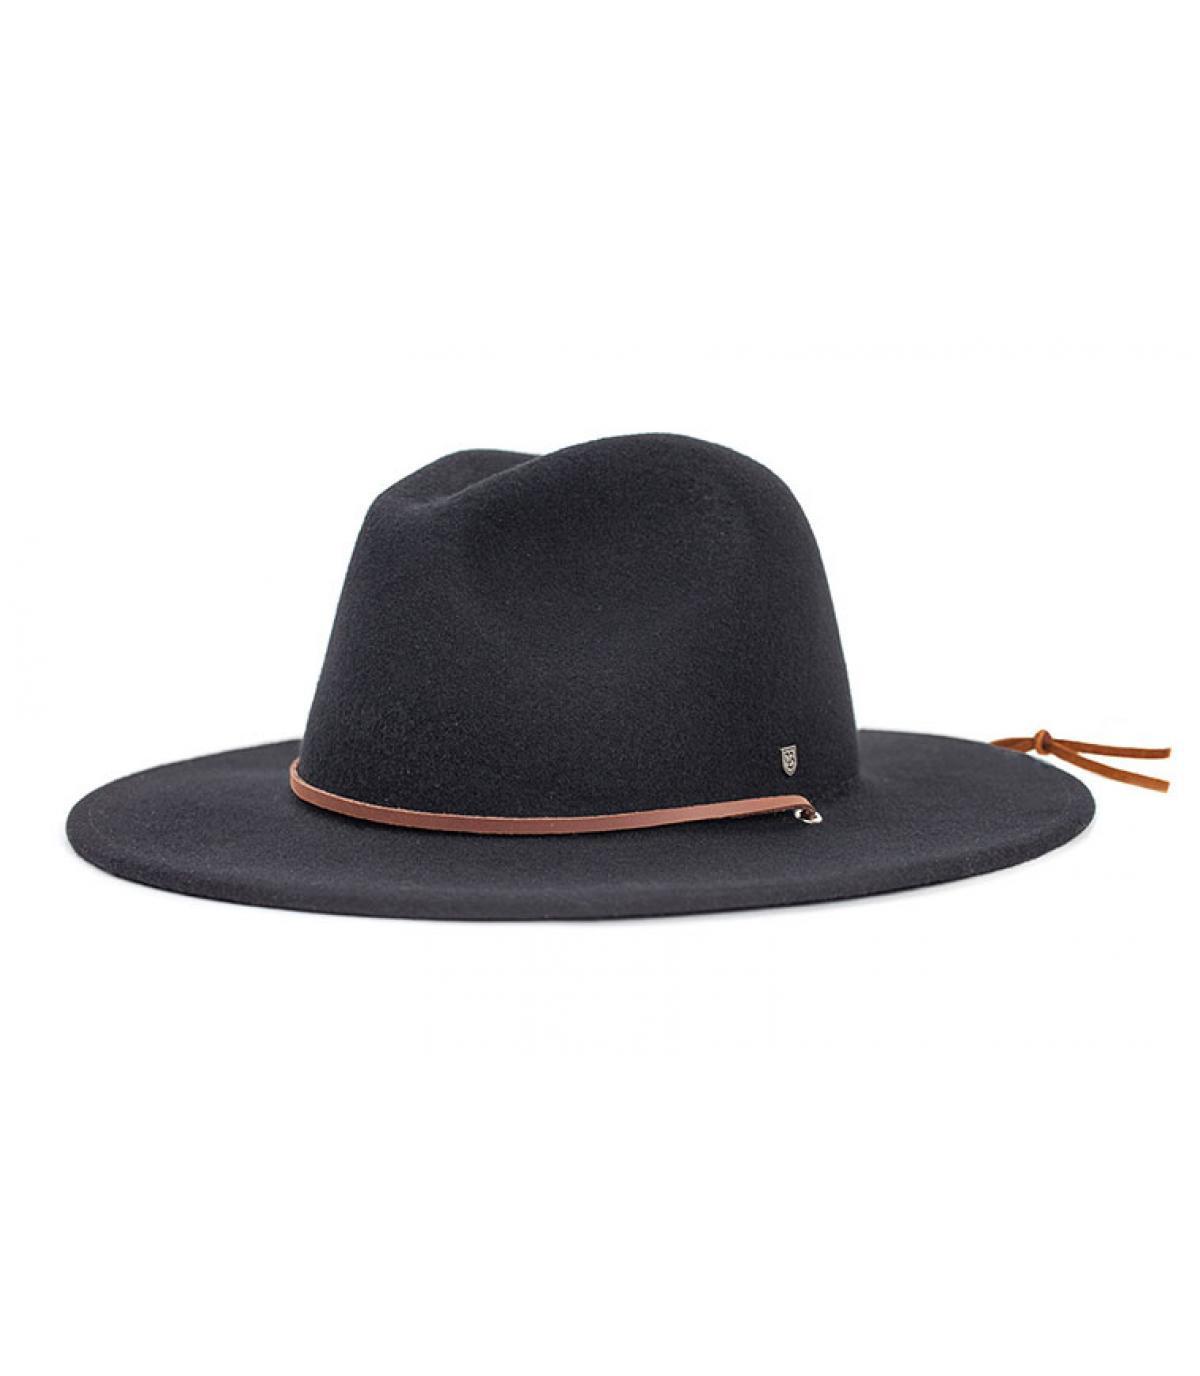 cappello nero Fedora